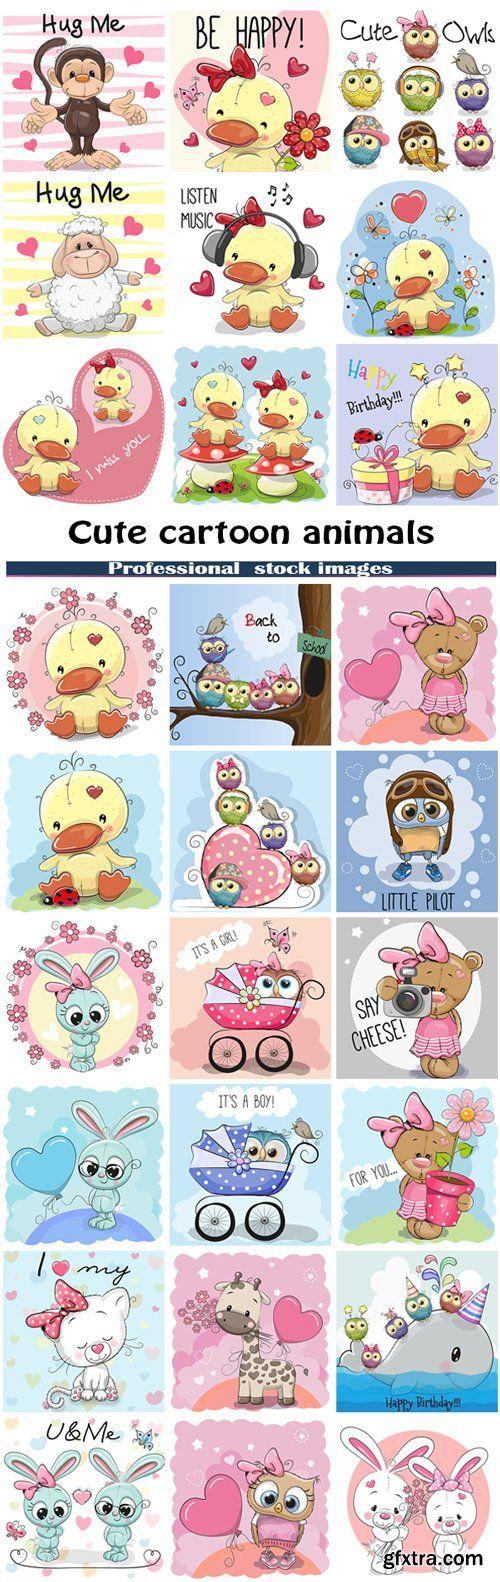 Cute cartoon animals #2